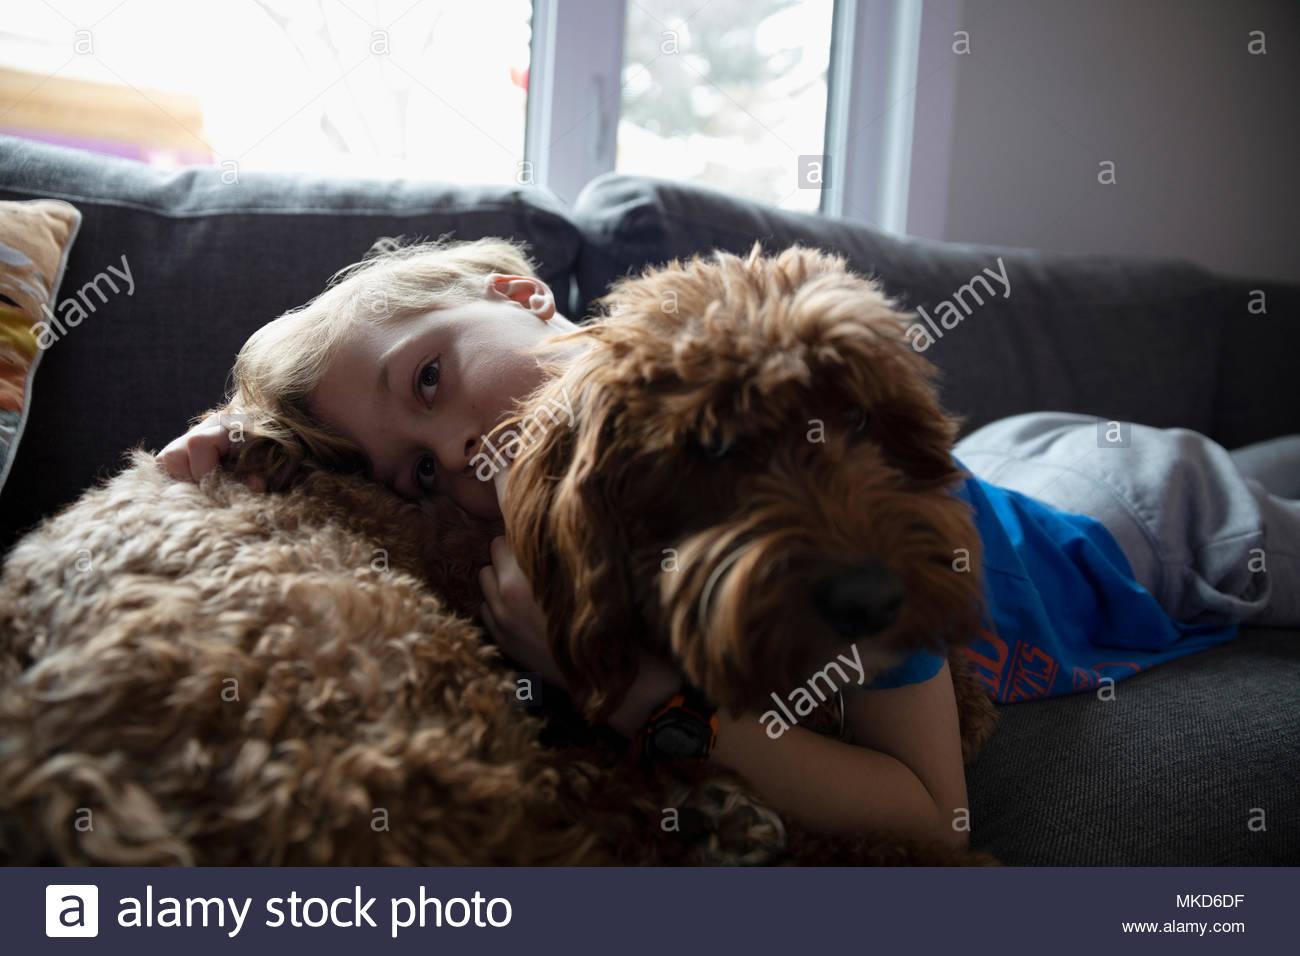 Portrait affectionate boy cuddling cute dog on living room sofa - Stock Image